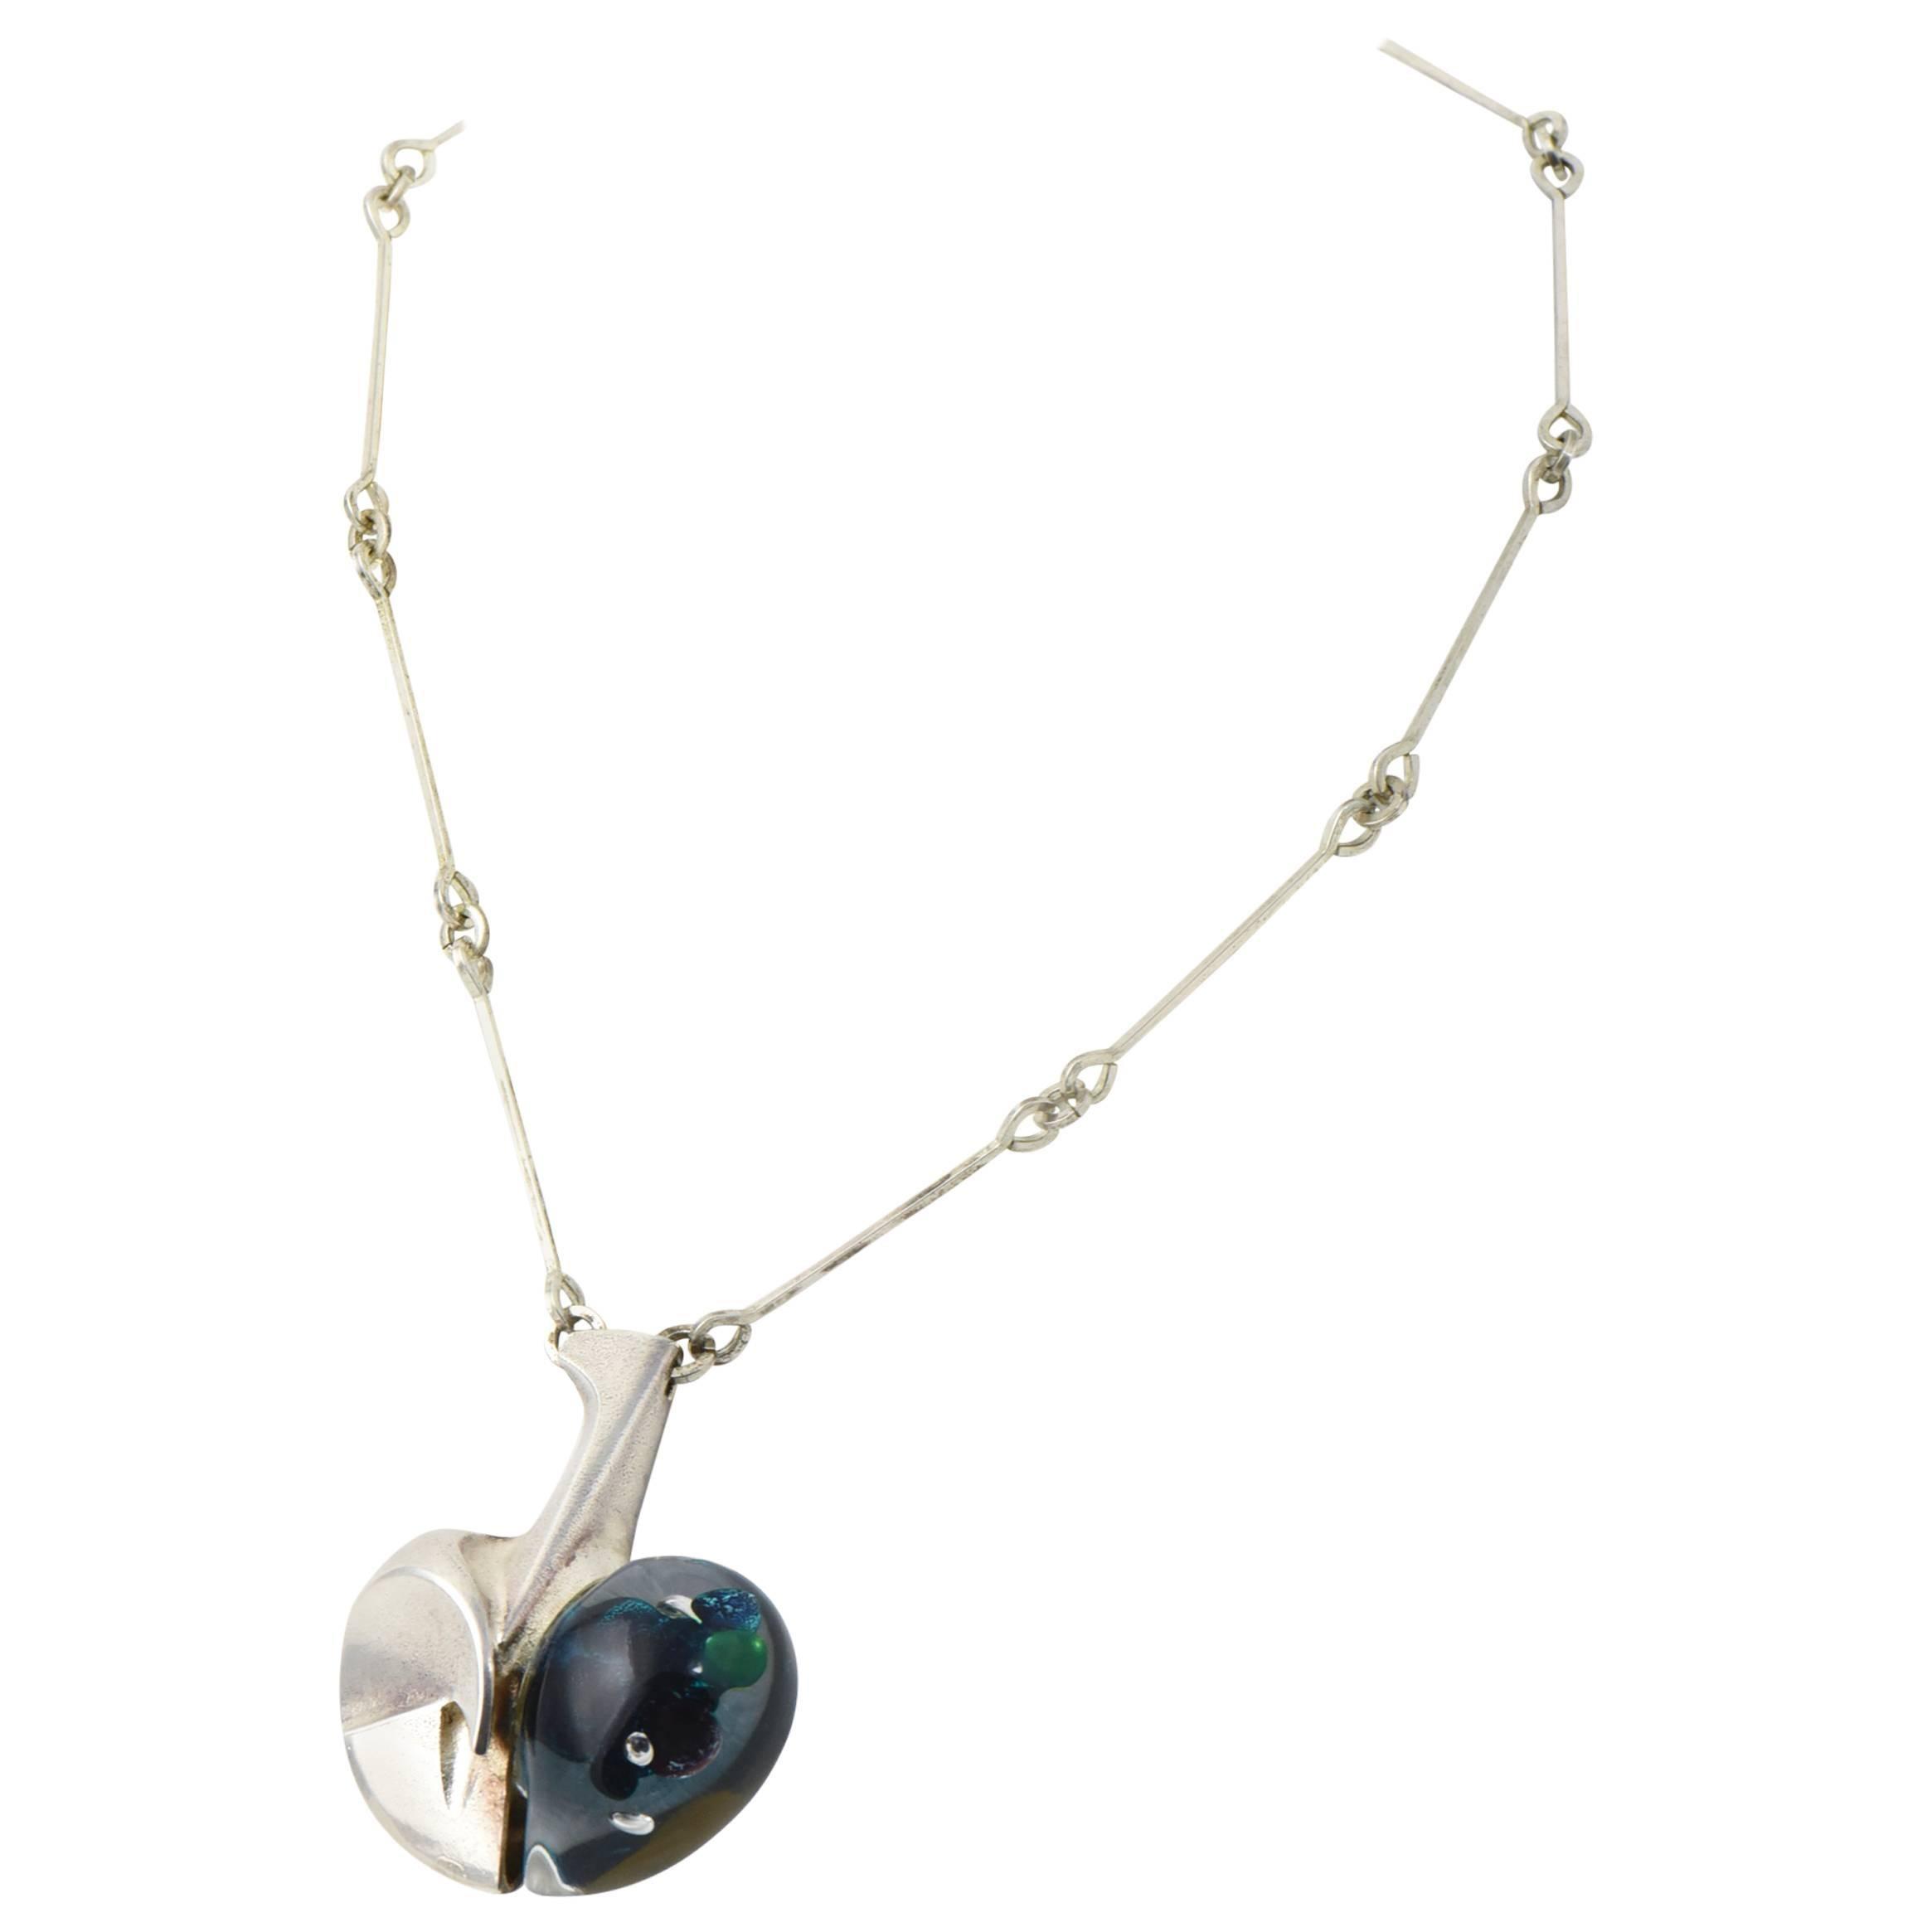 Modernist Organic Lapponia Björn Weckström Space Apple Silver Acrylic Necklace